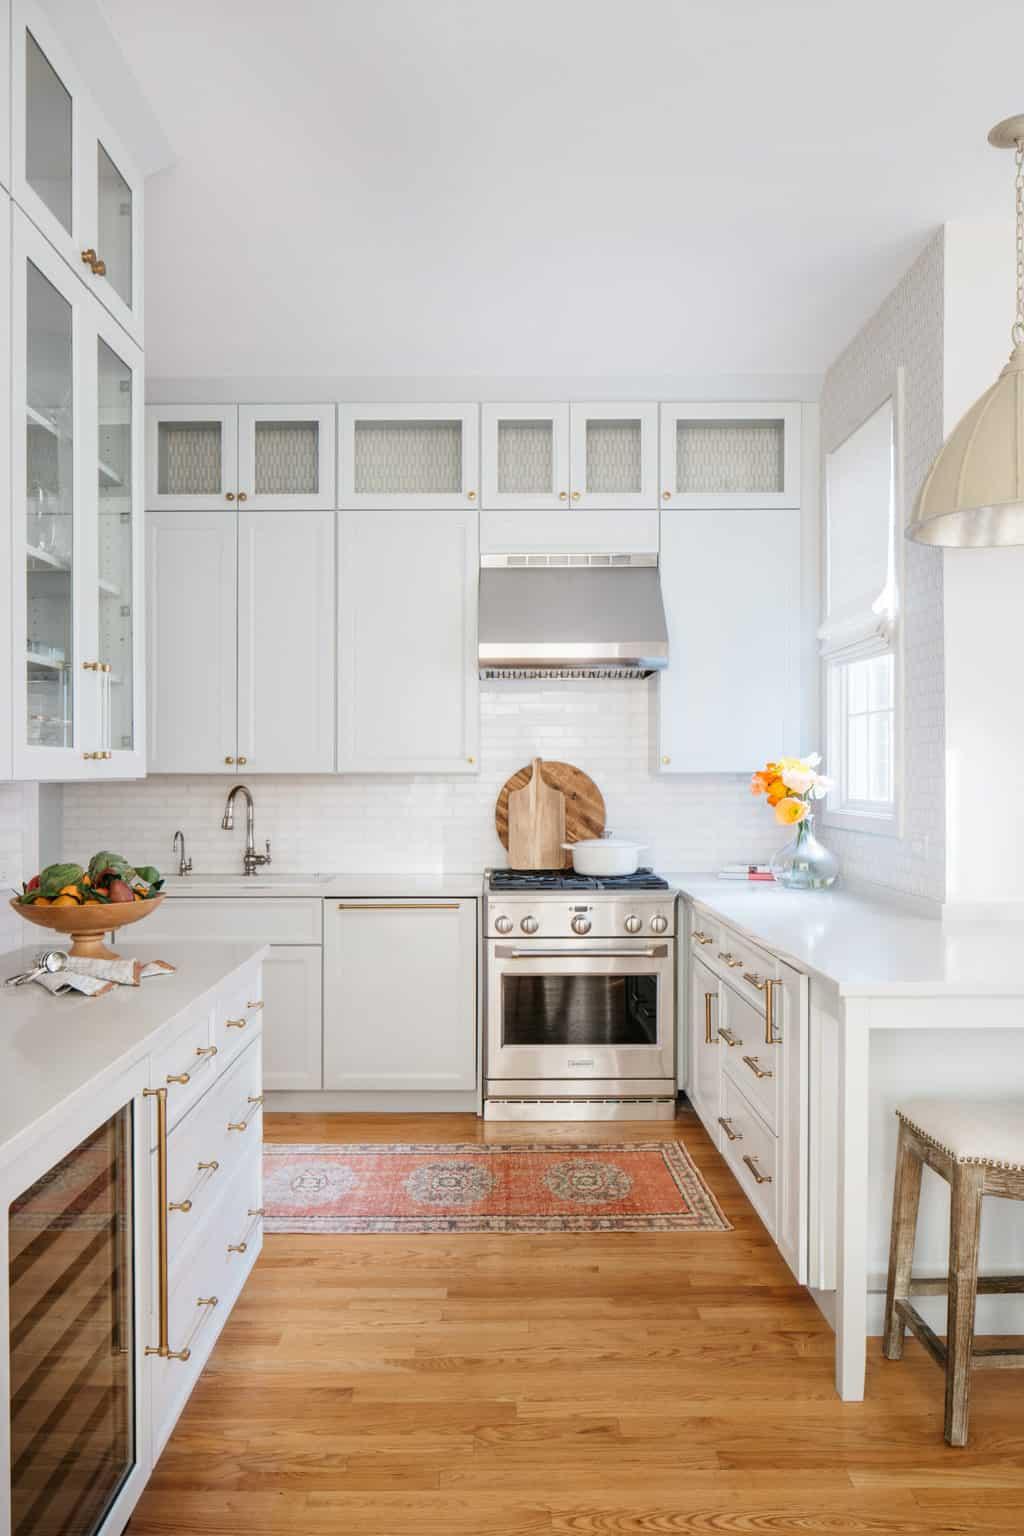 wallpaper+in+kitchen+centered+by+design